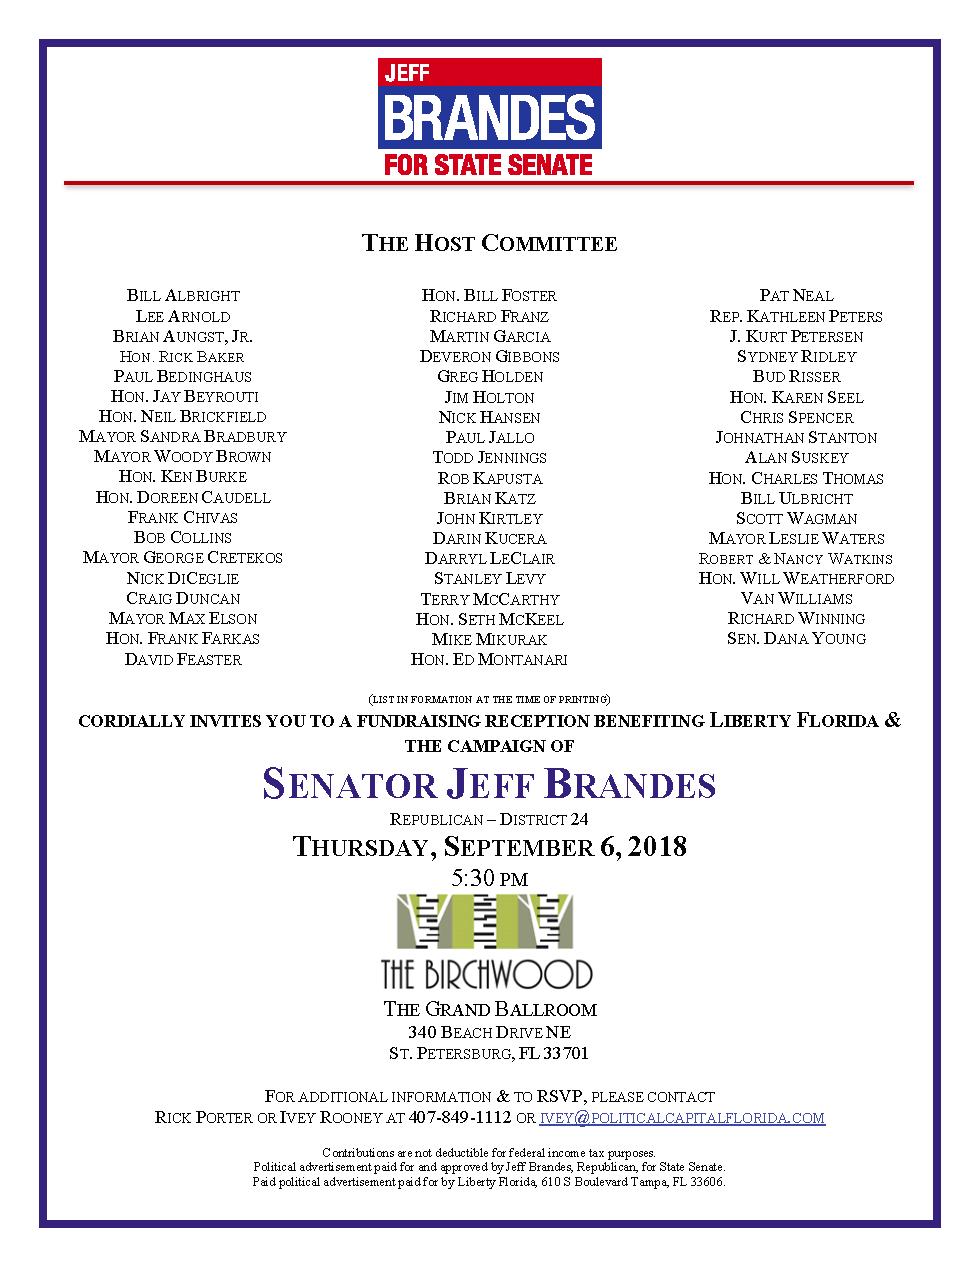 Brandes fundraiser 9.6.2018